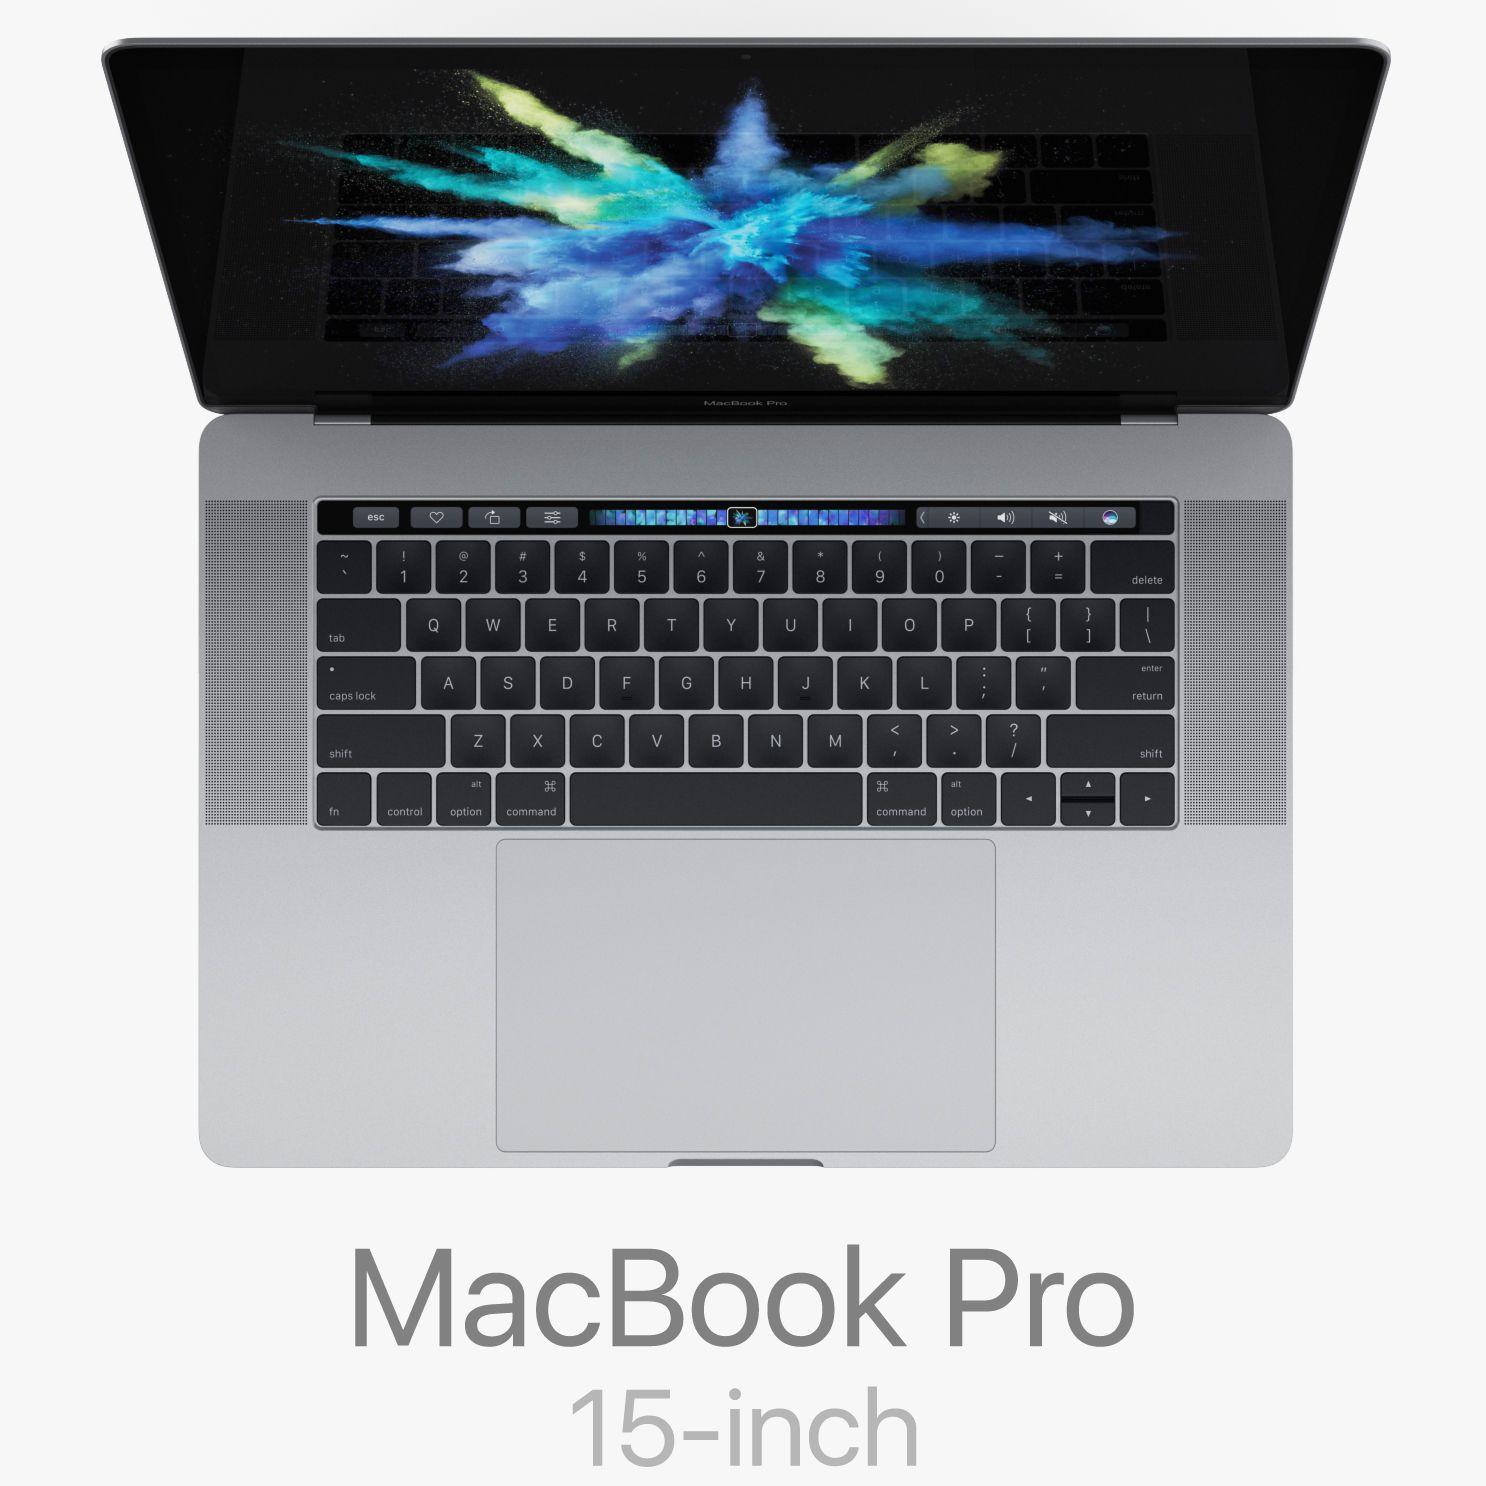 13 Inch Macbook Pro Macbook Pro Laptop Macbook Pro Free Macbook Pro